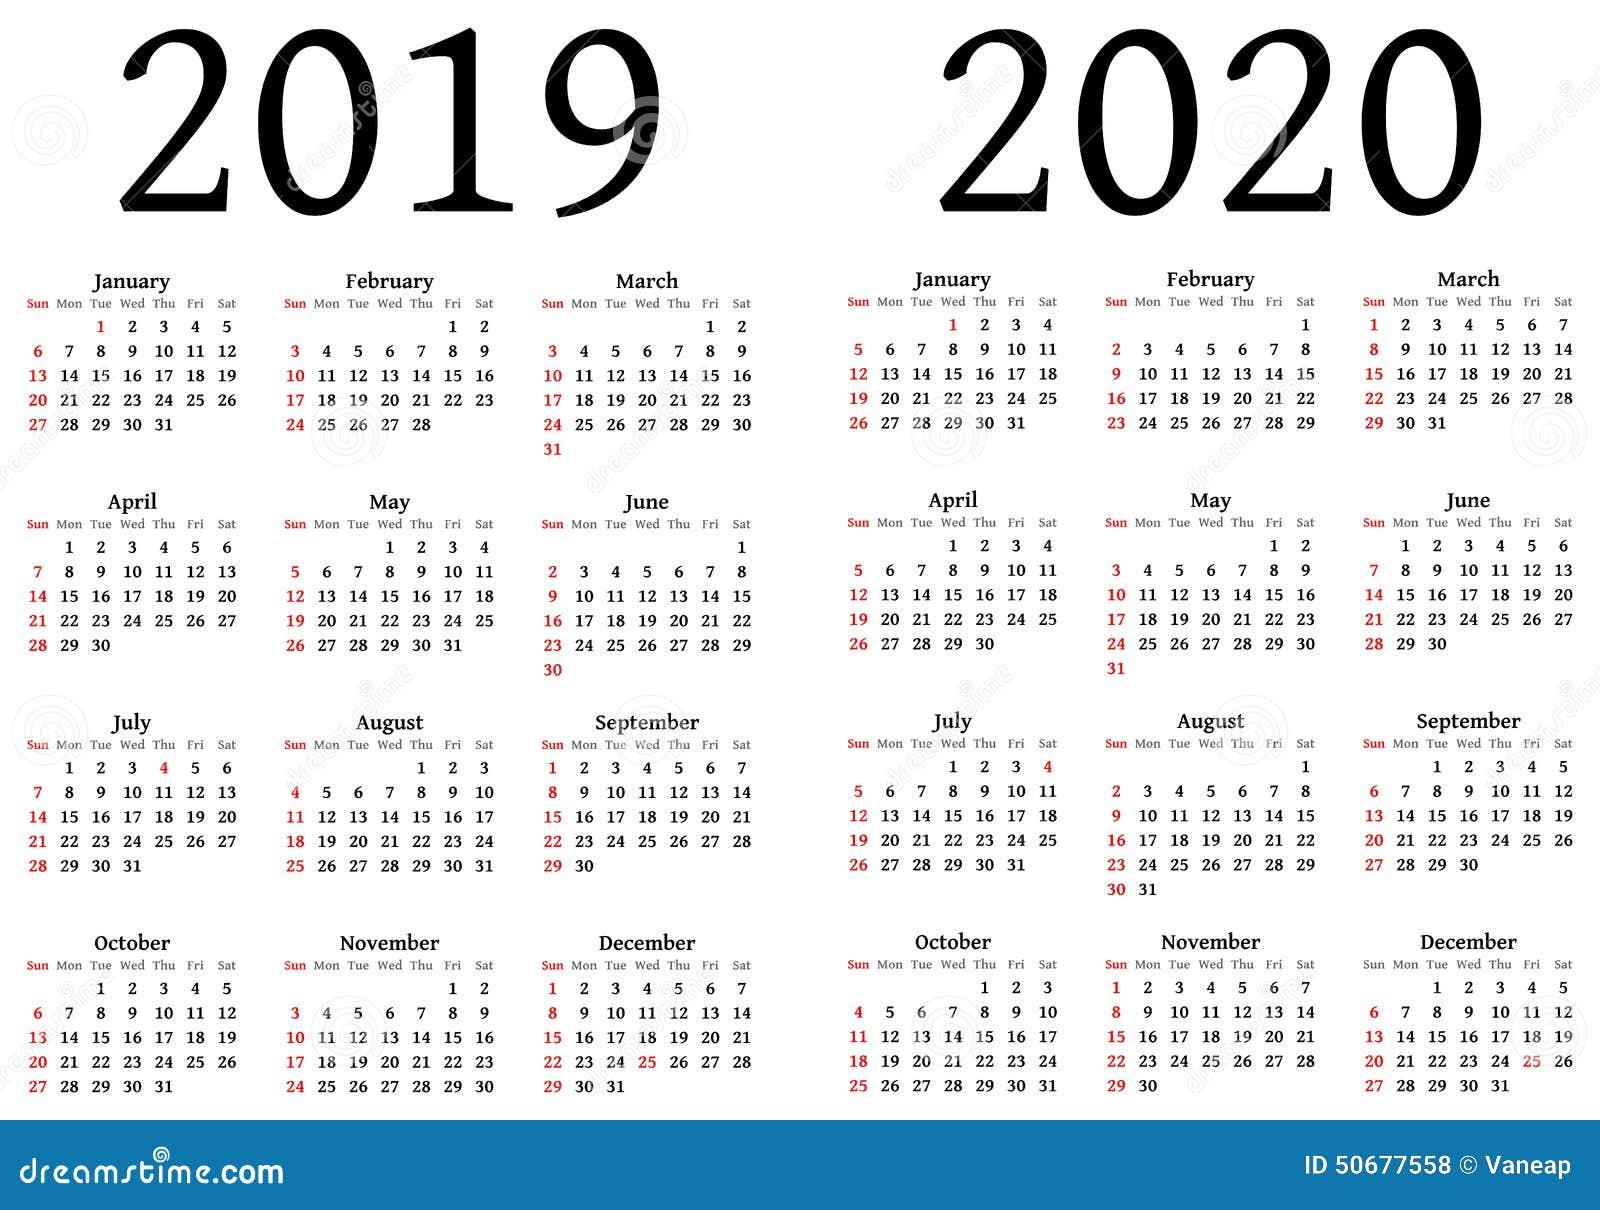 Calendario Colombia 2020.2020 Stock Illustrations 36 500 2020 Stock Illustrations